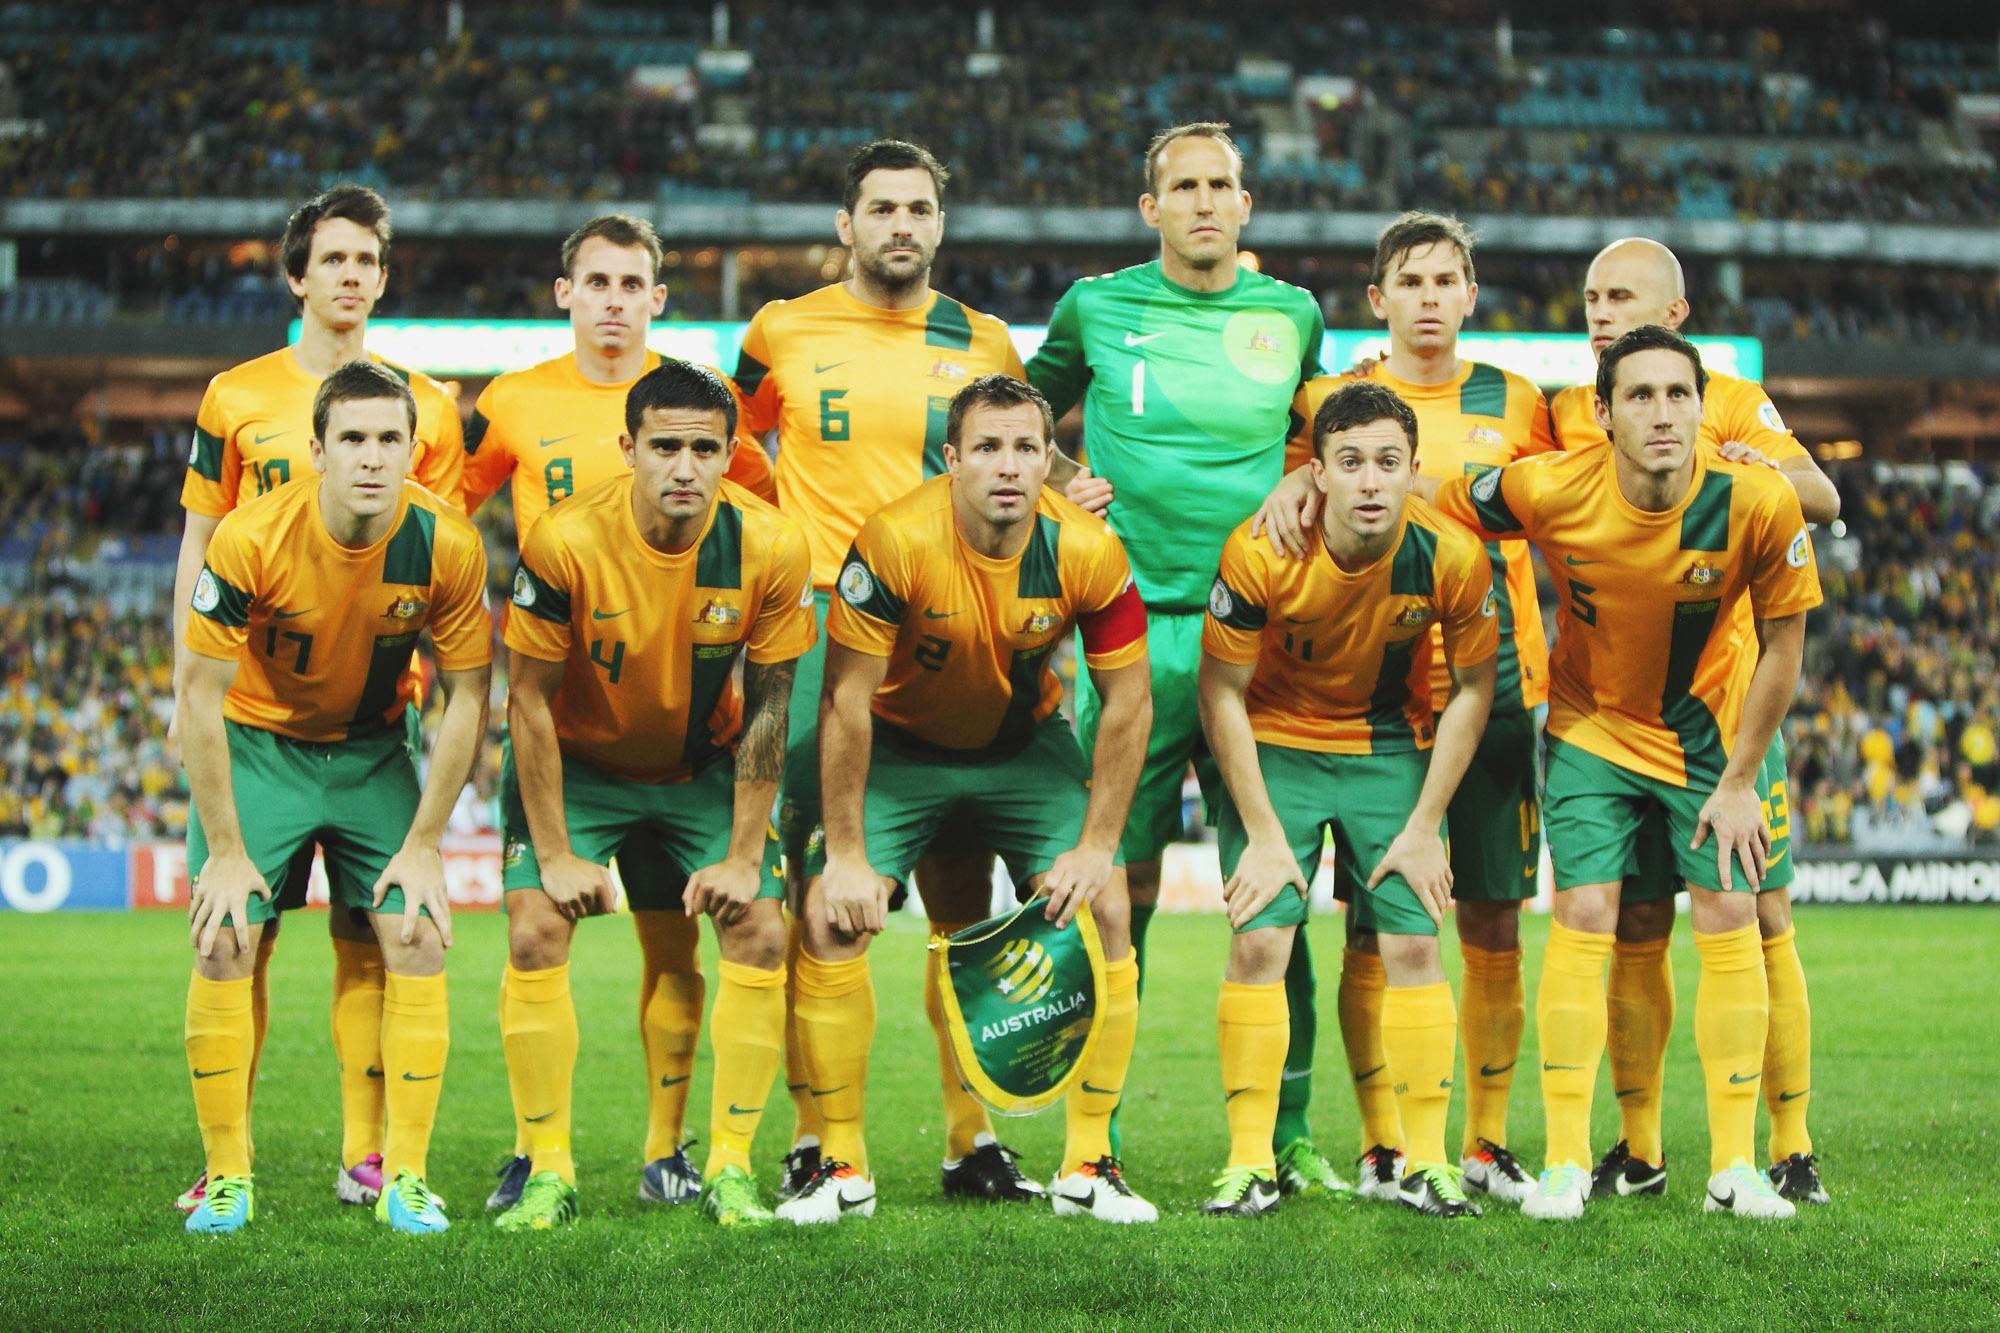 1._George_Suresh_-_Socceroos_vs_Iraq.jpg